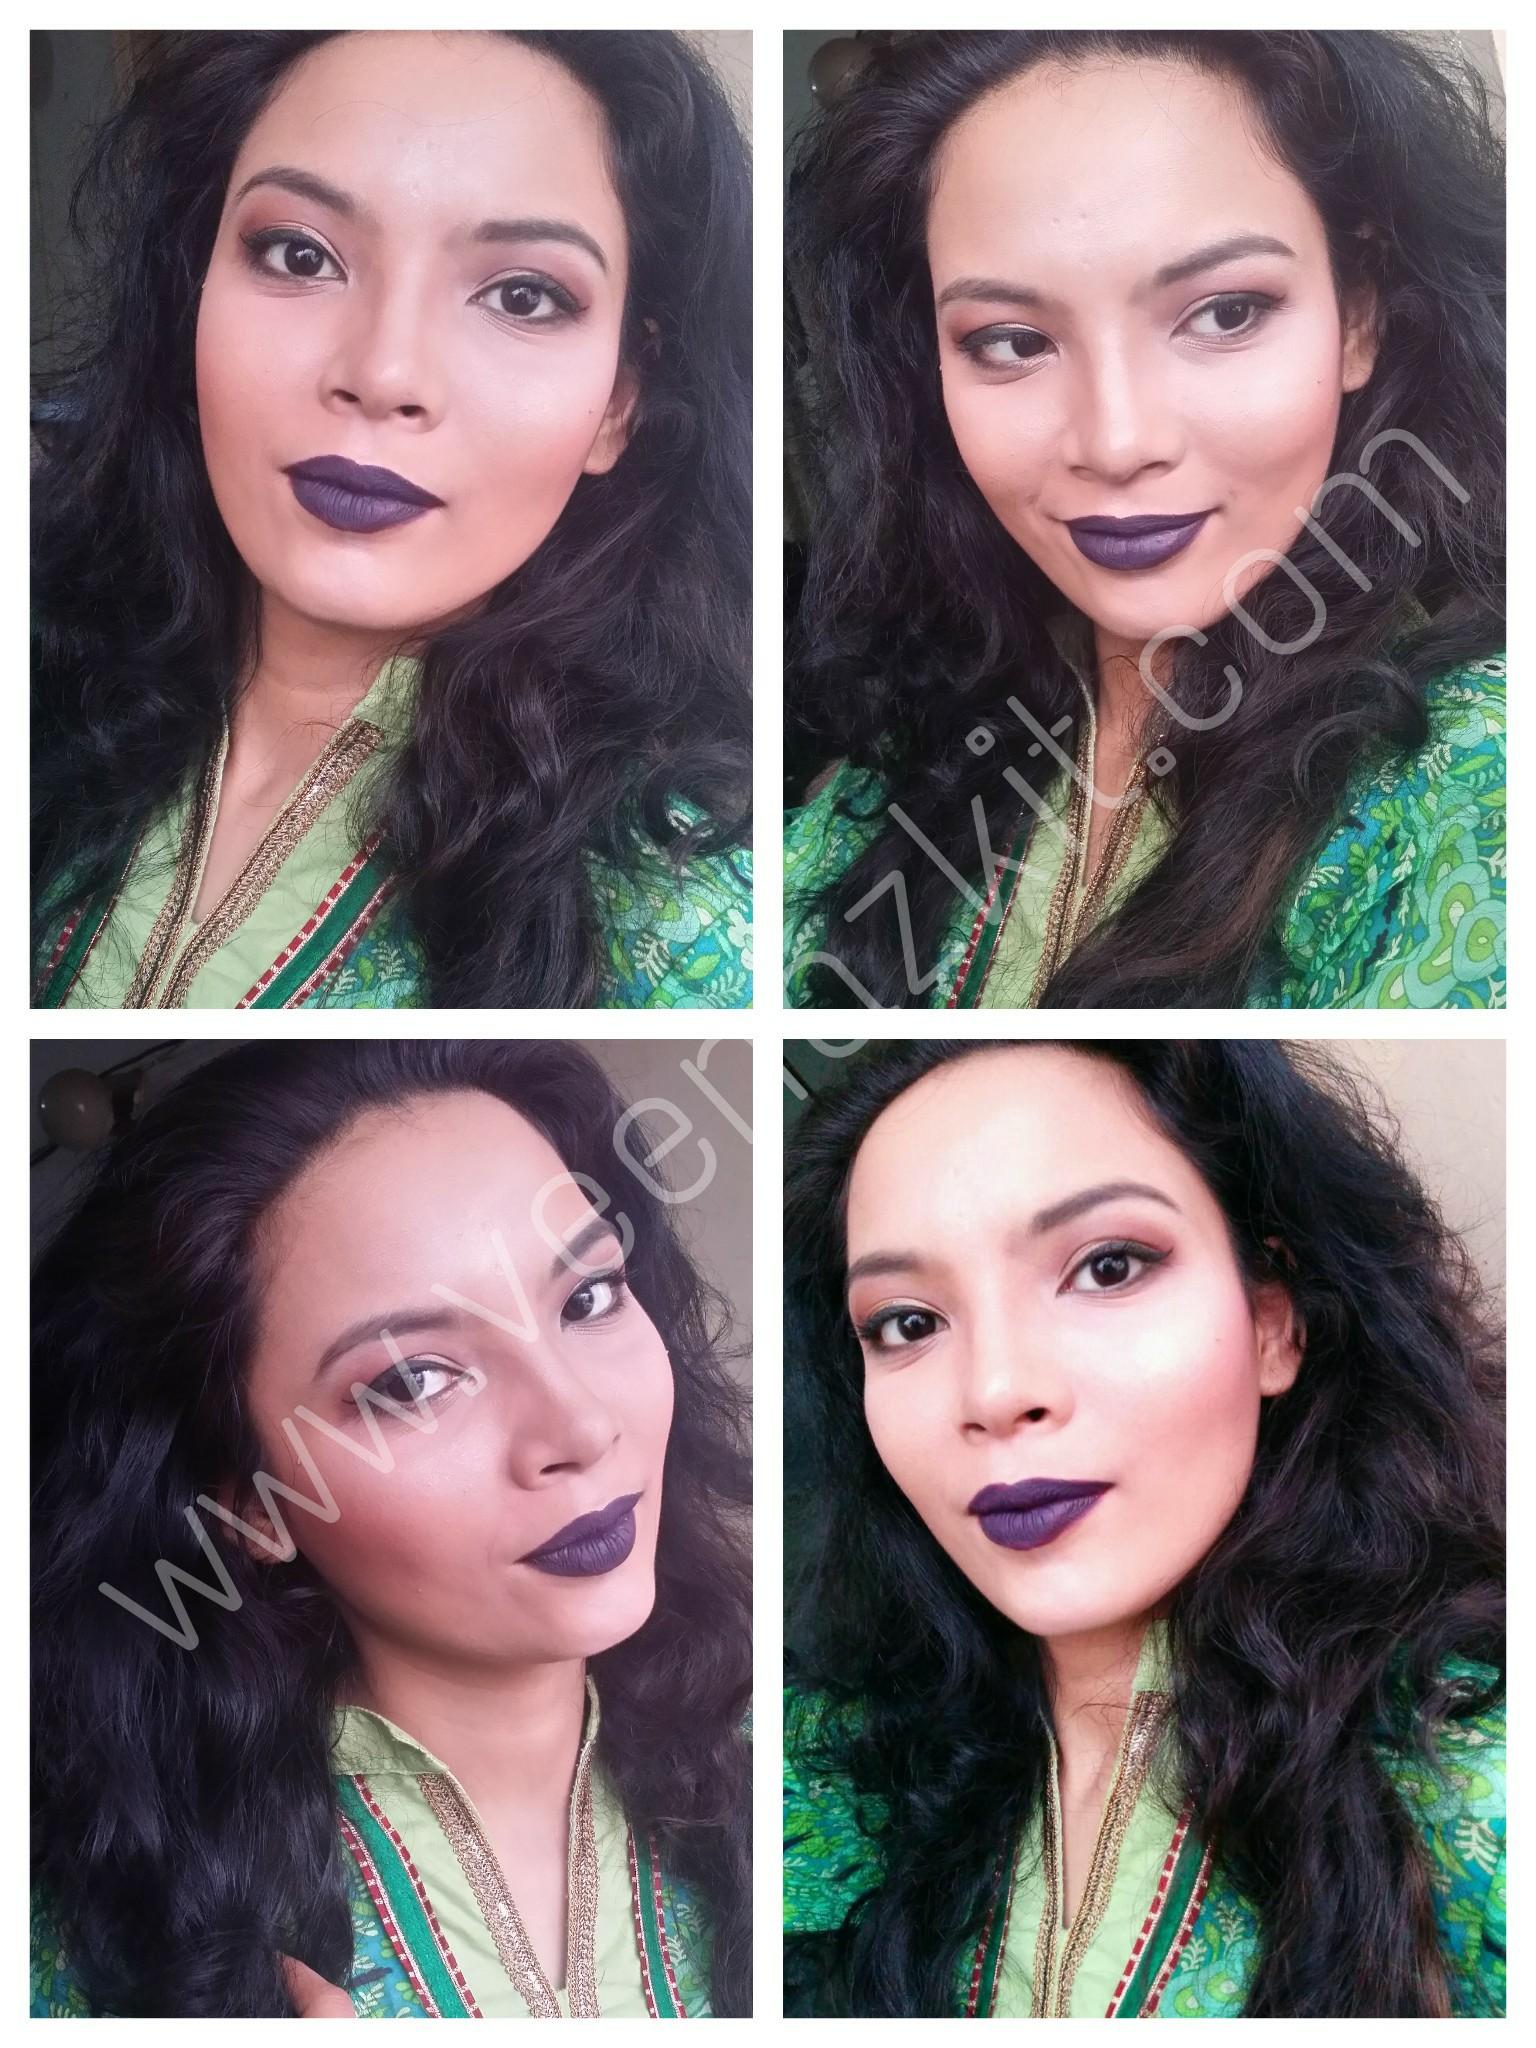 Sister's Makeup look #1